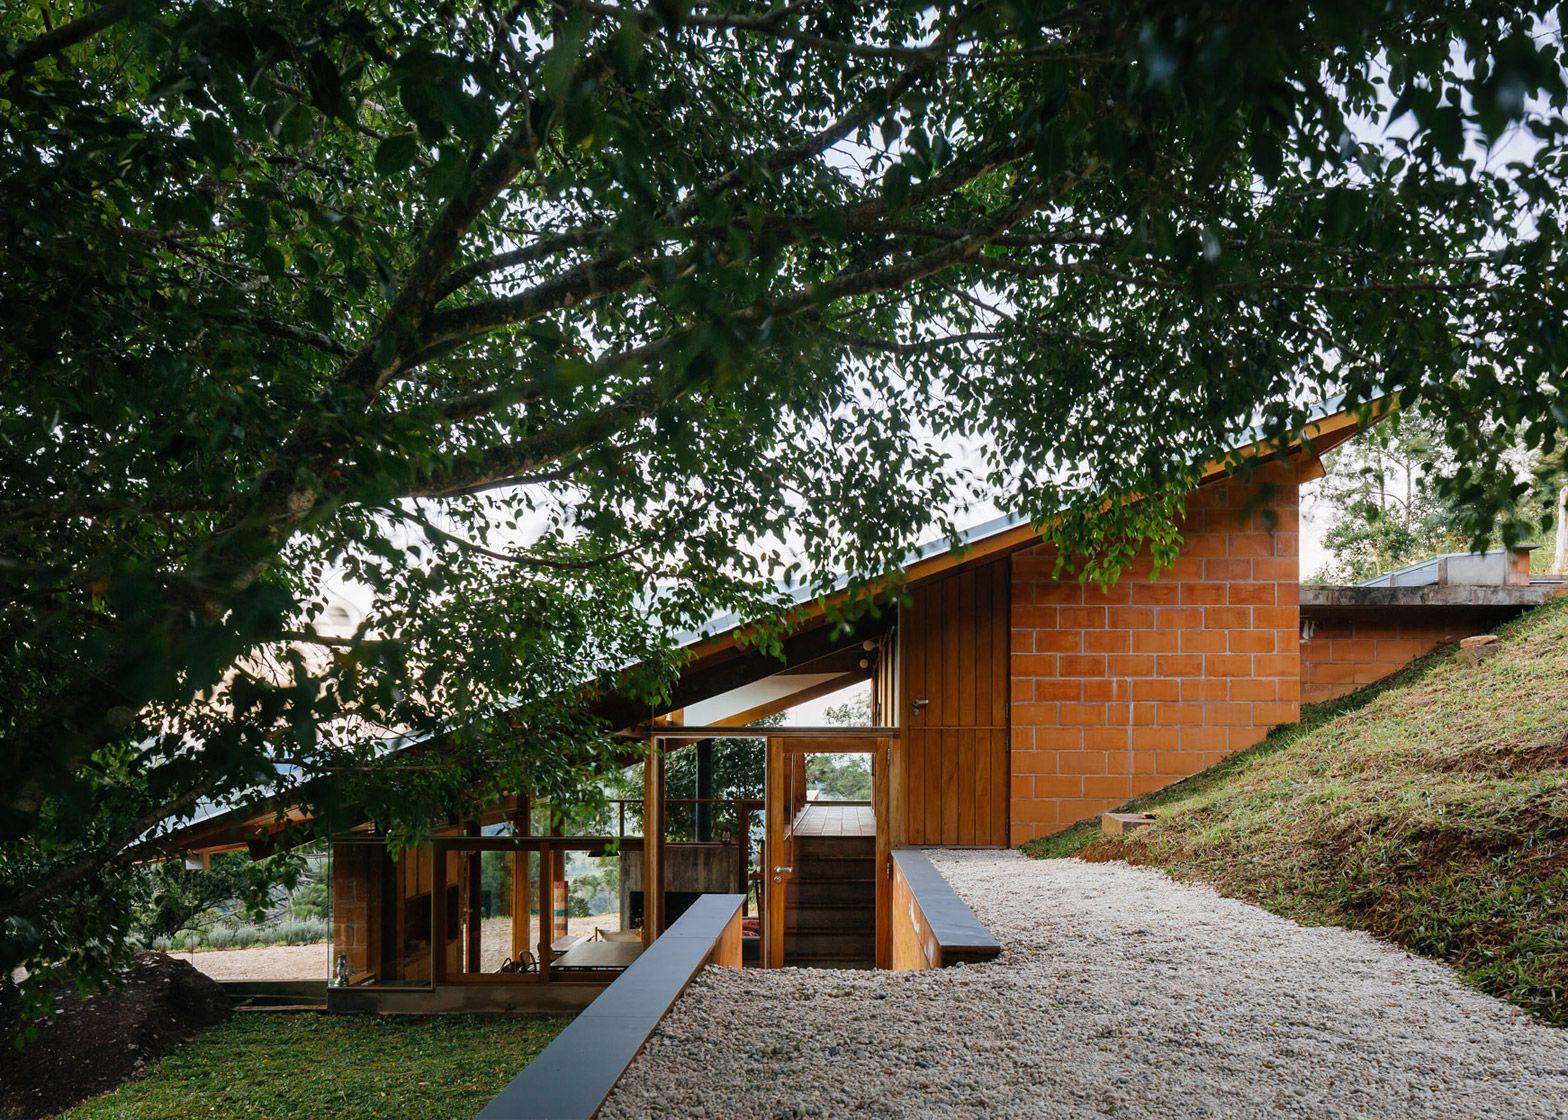 Half-slope House steps into a hillside in rural Brazil ...